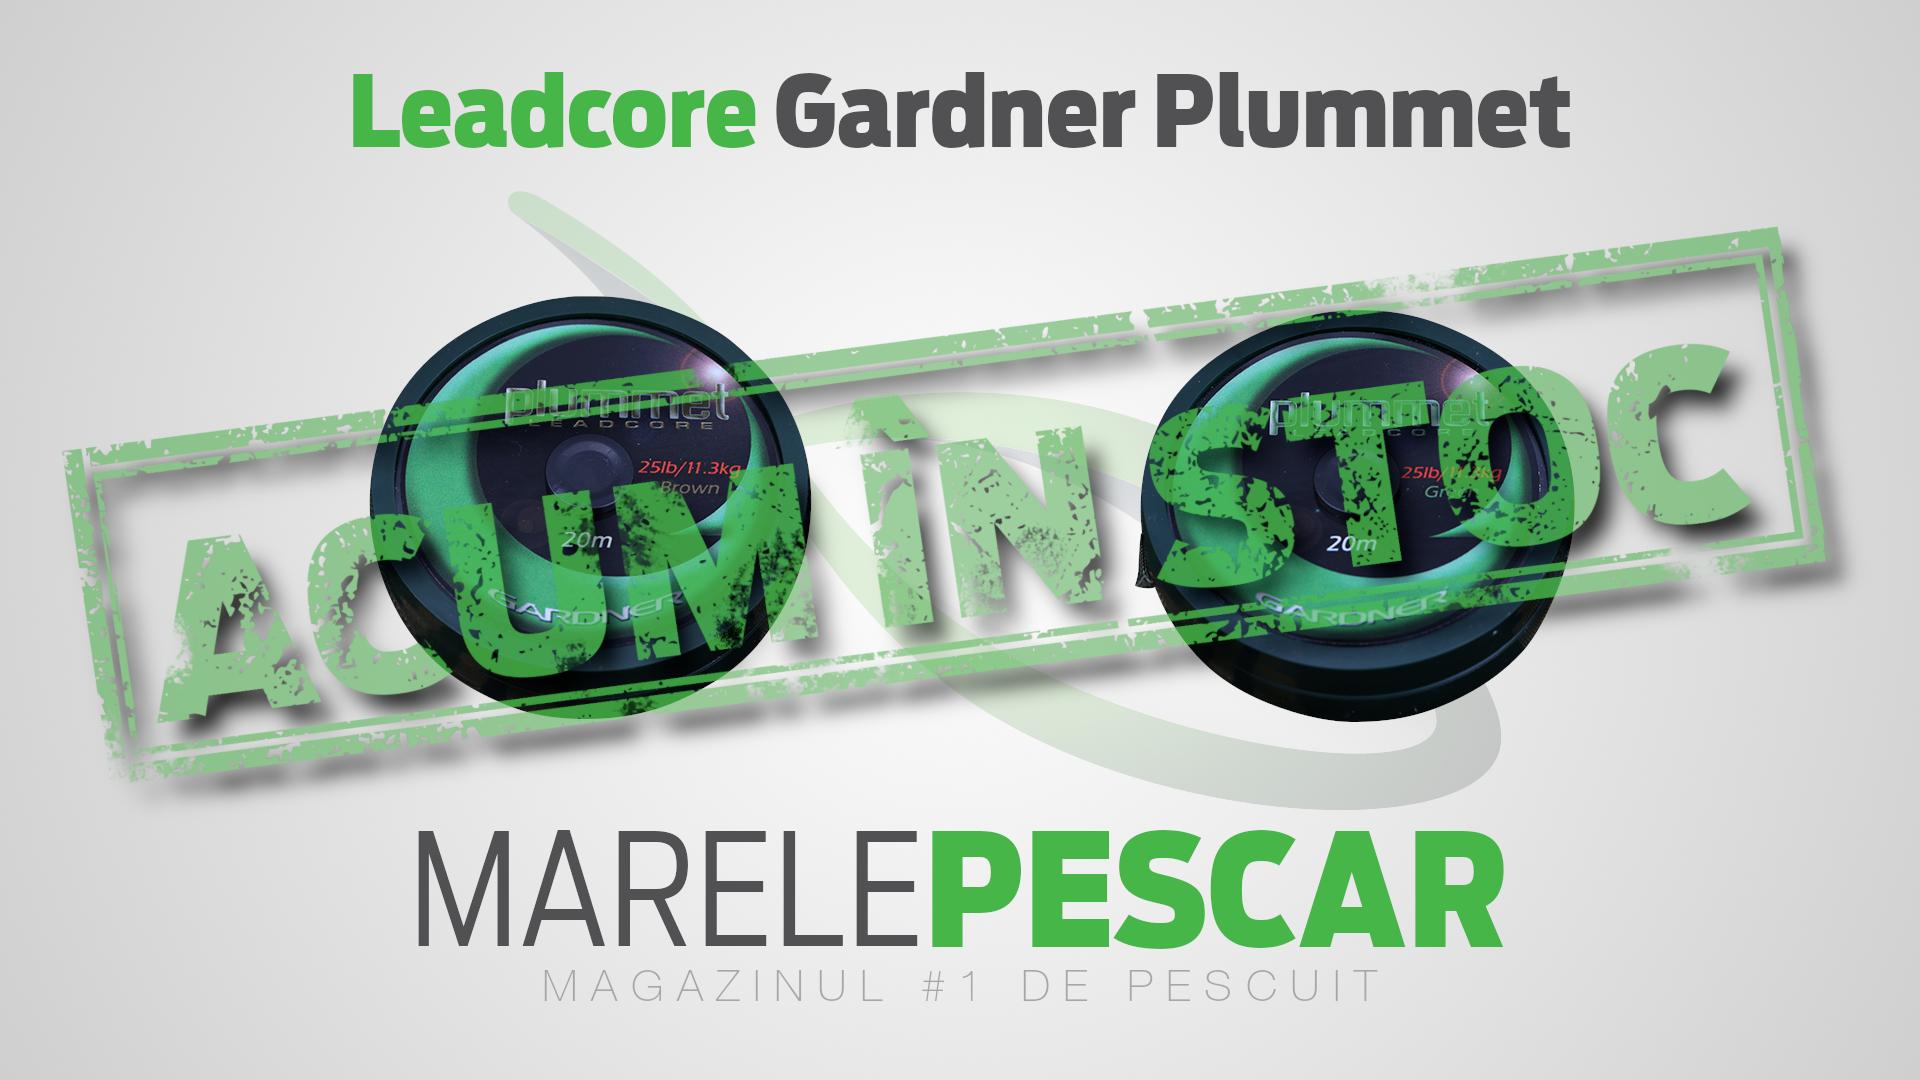 Leadcore Gardner Plummet (acum în stoc)